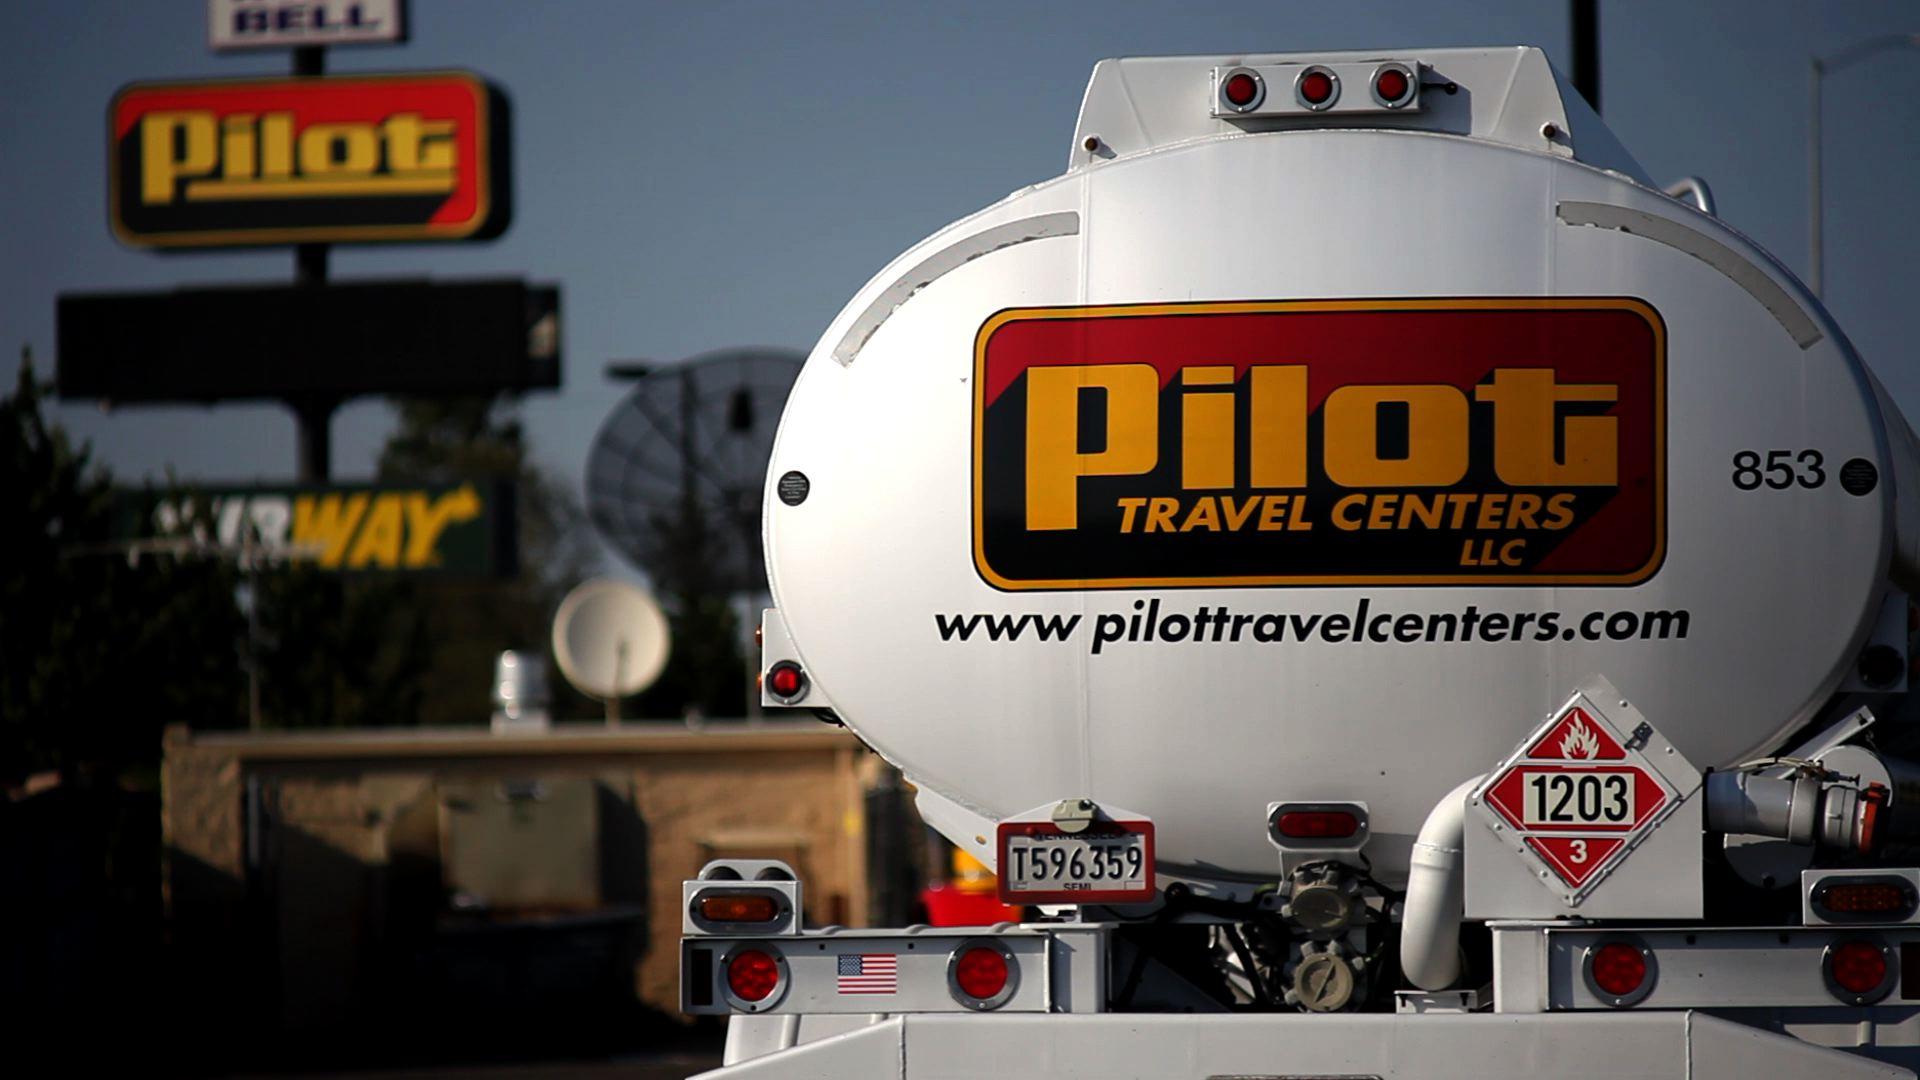 RICO Claim and Big Guns Highlight Latest in Pilot Flying J Saga